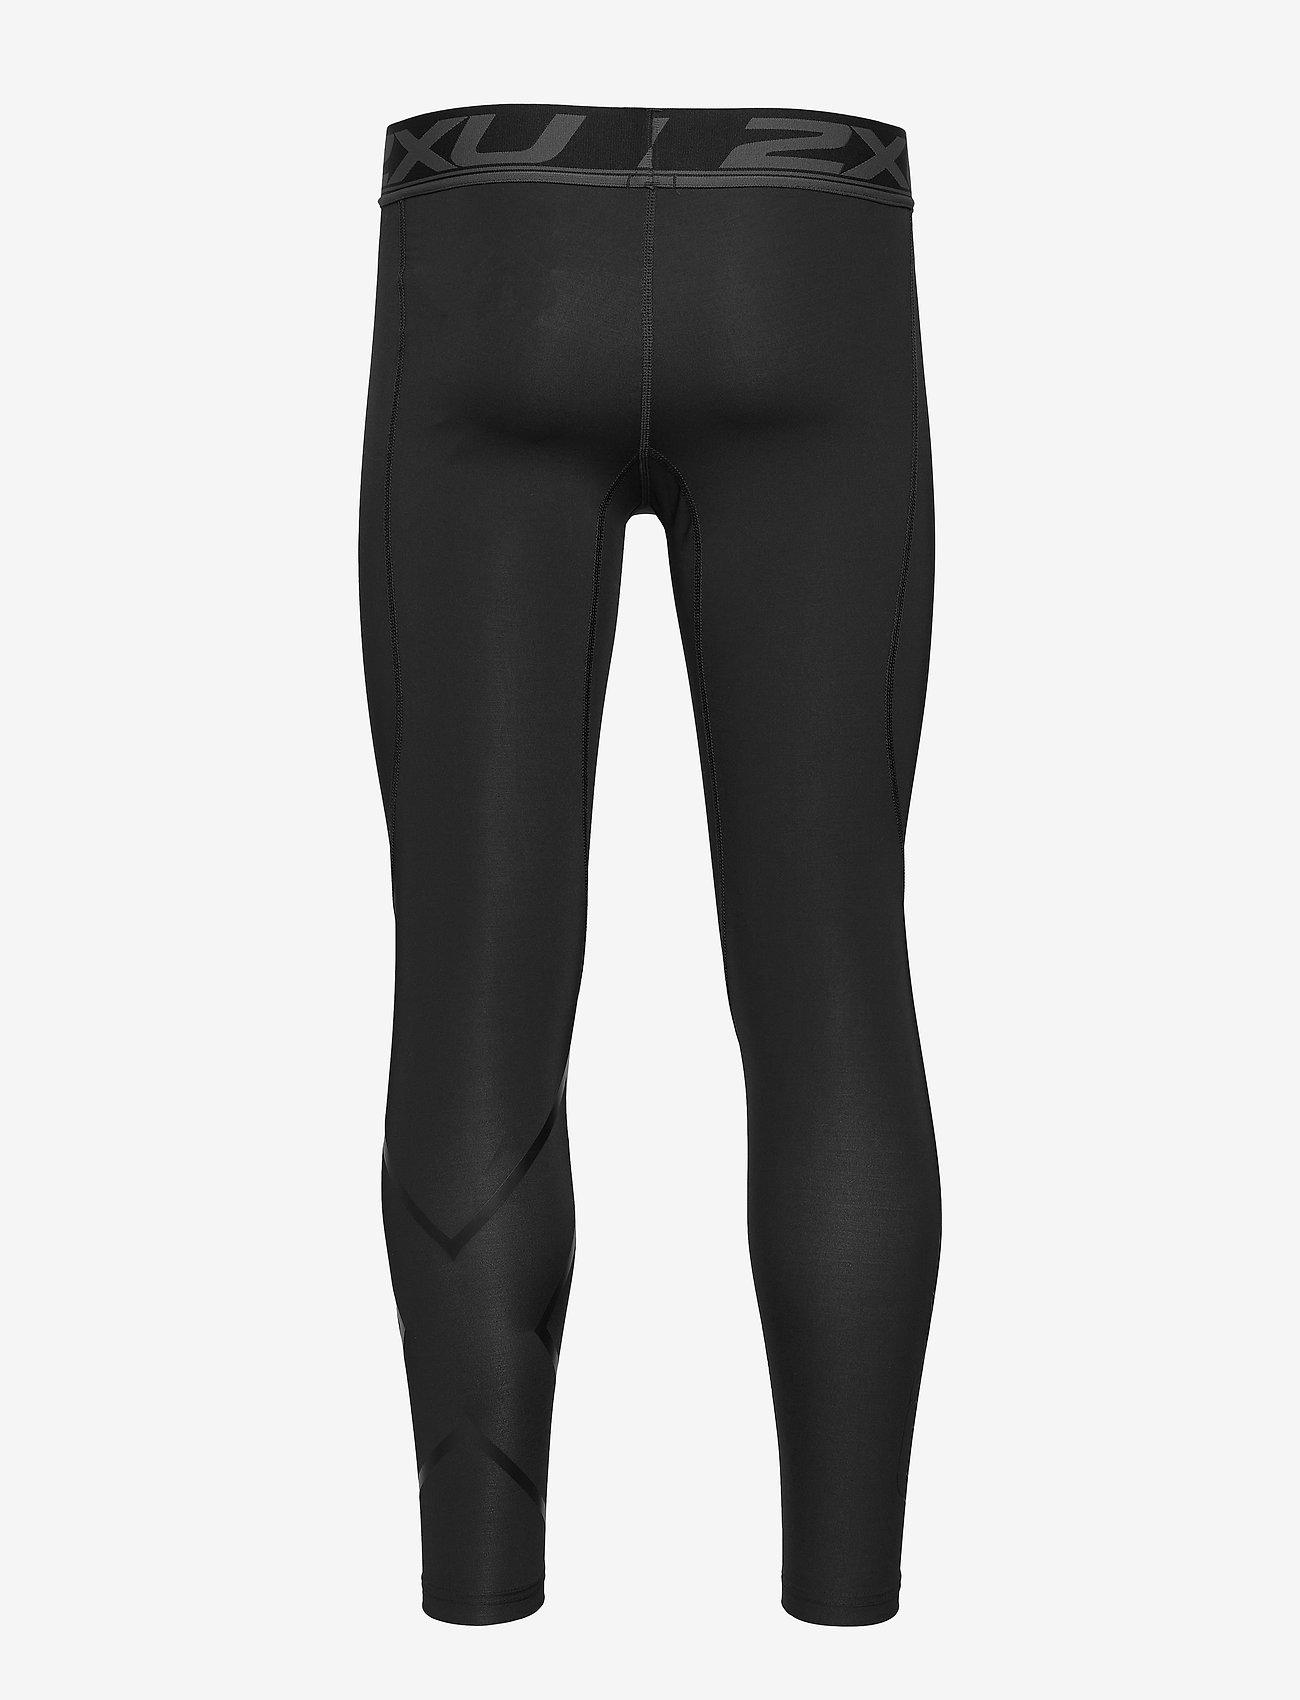 2XU - Accelerate Comp Tights-M - running & training tights - black/nero - 1